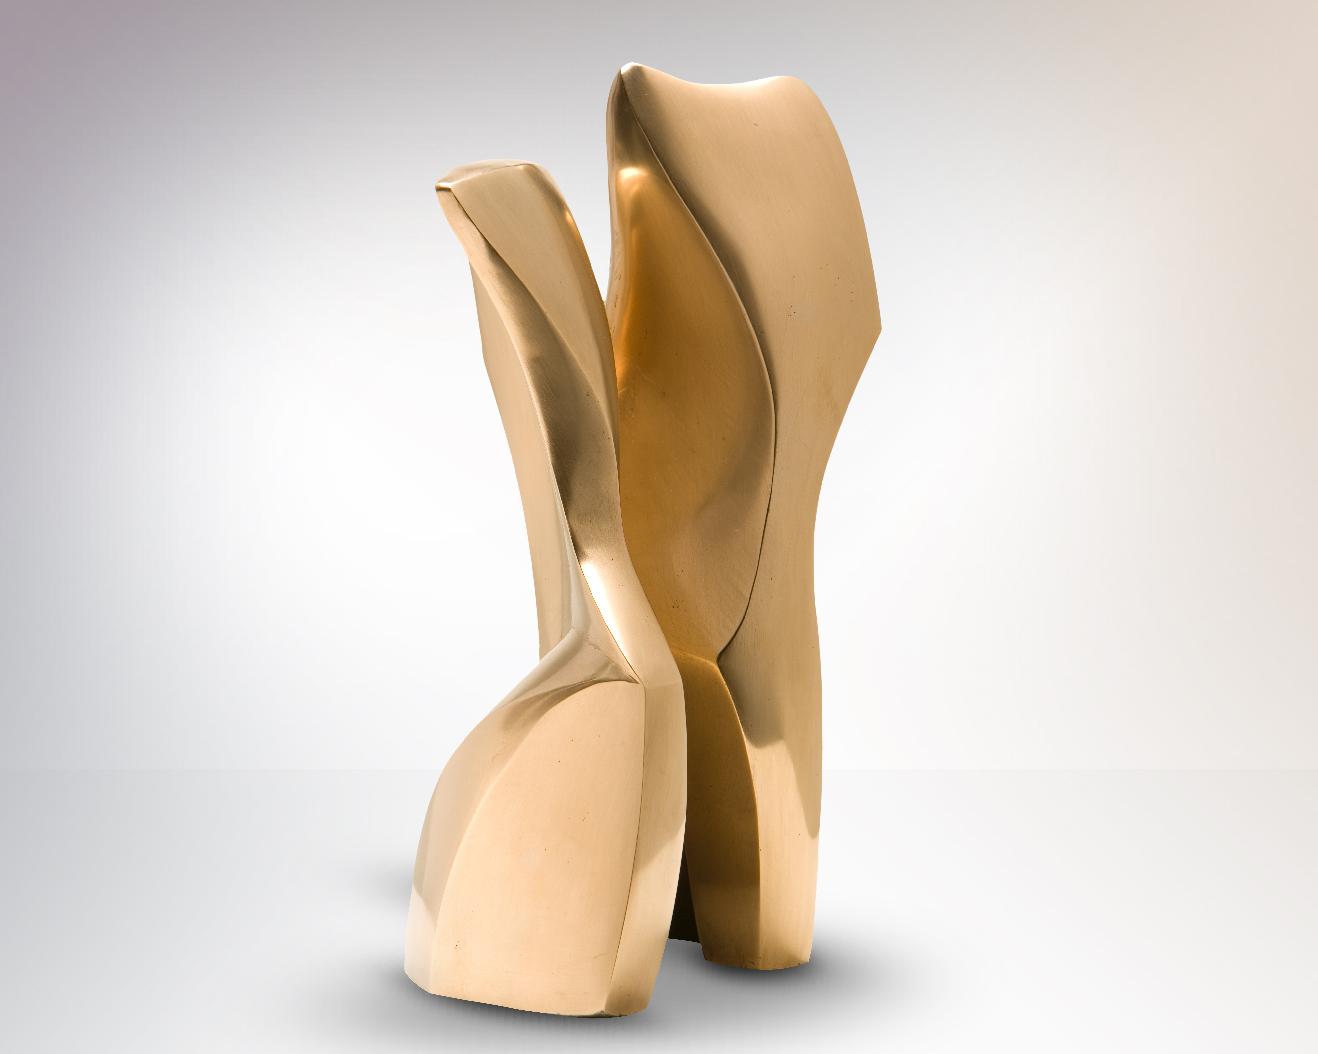 Danza, sculpture en bronze poli, 28 x 13 x 10 cm